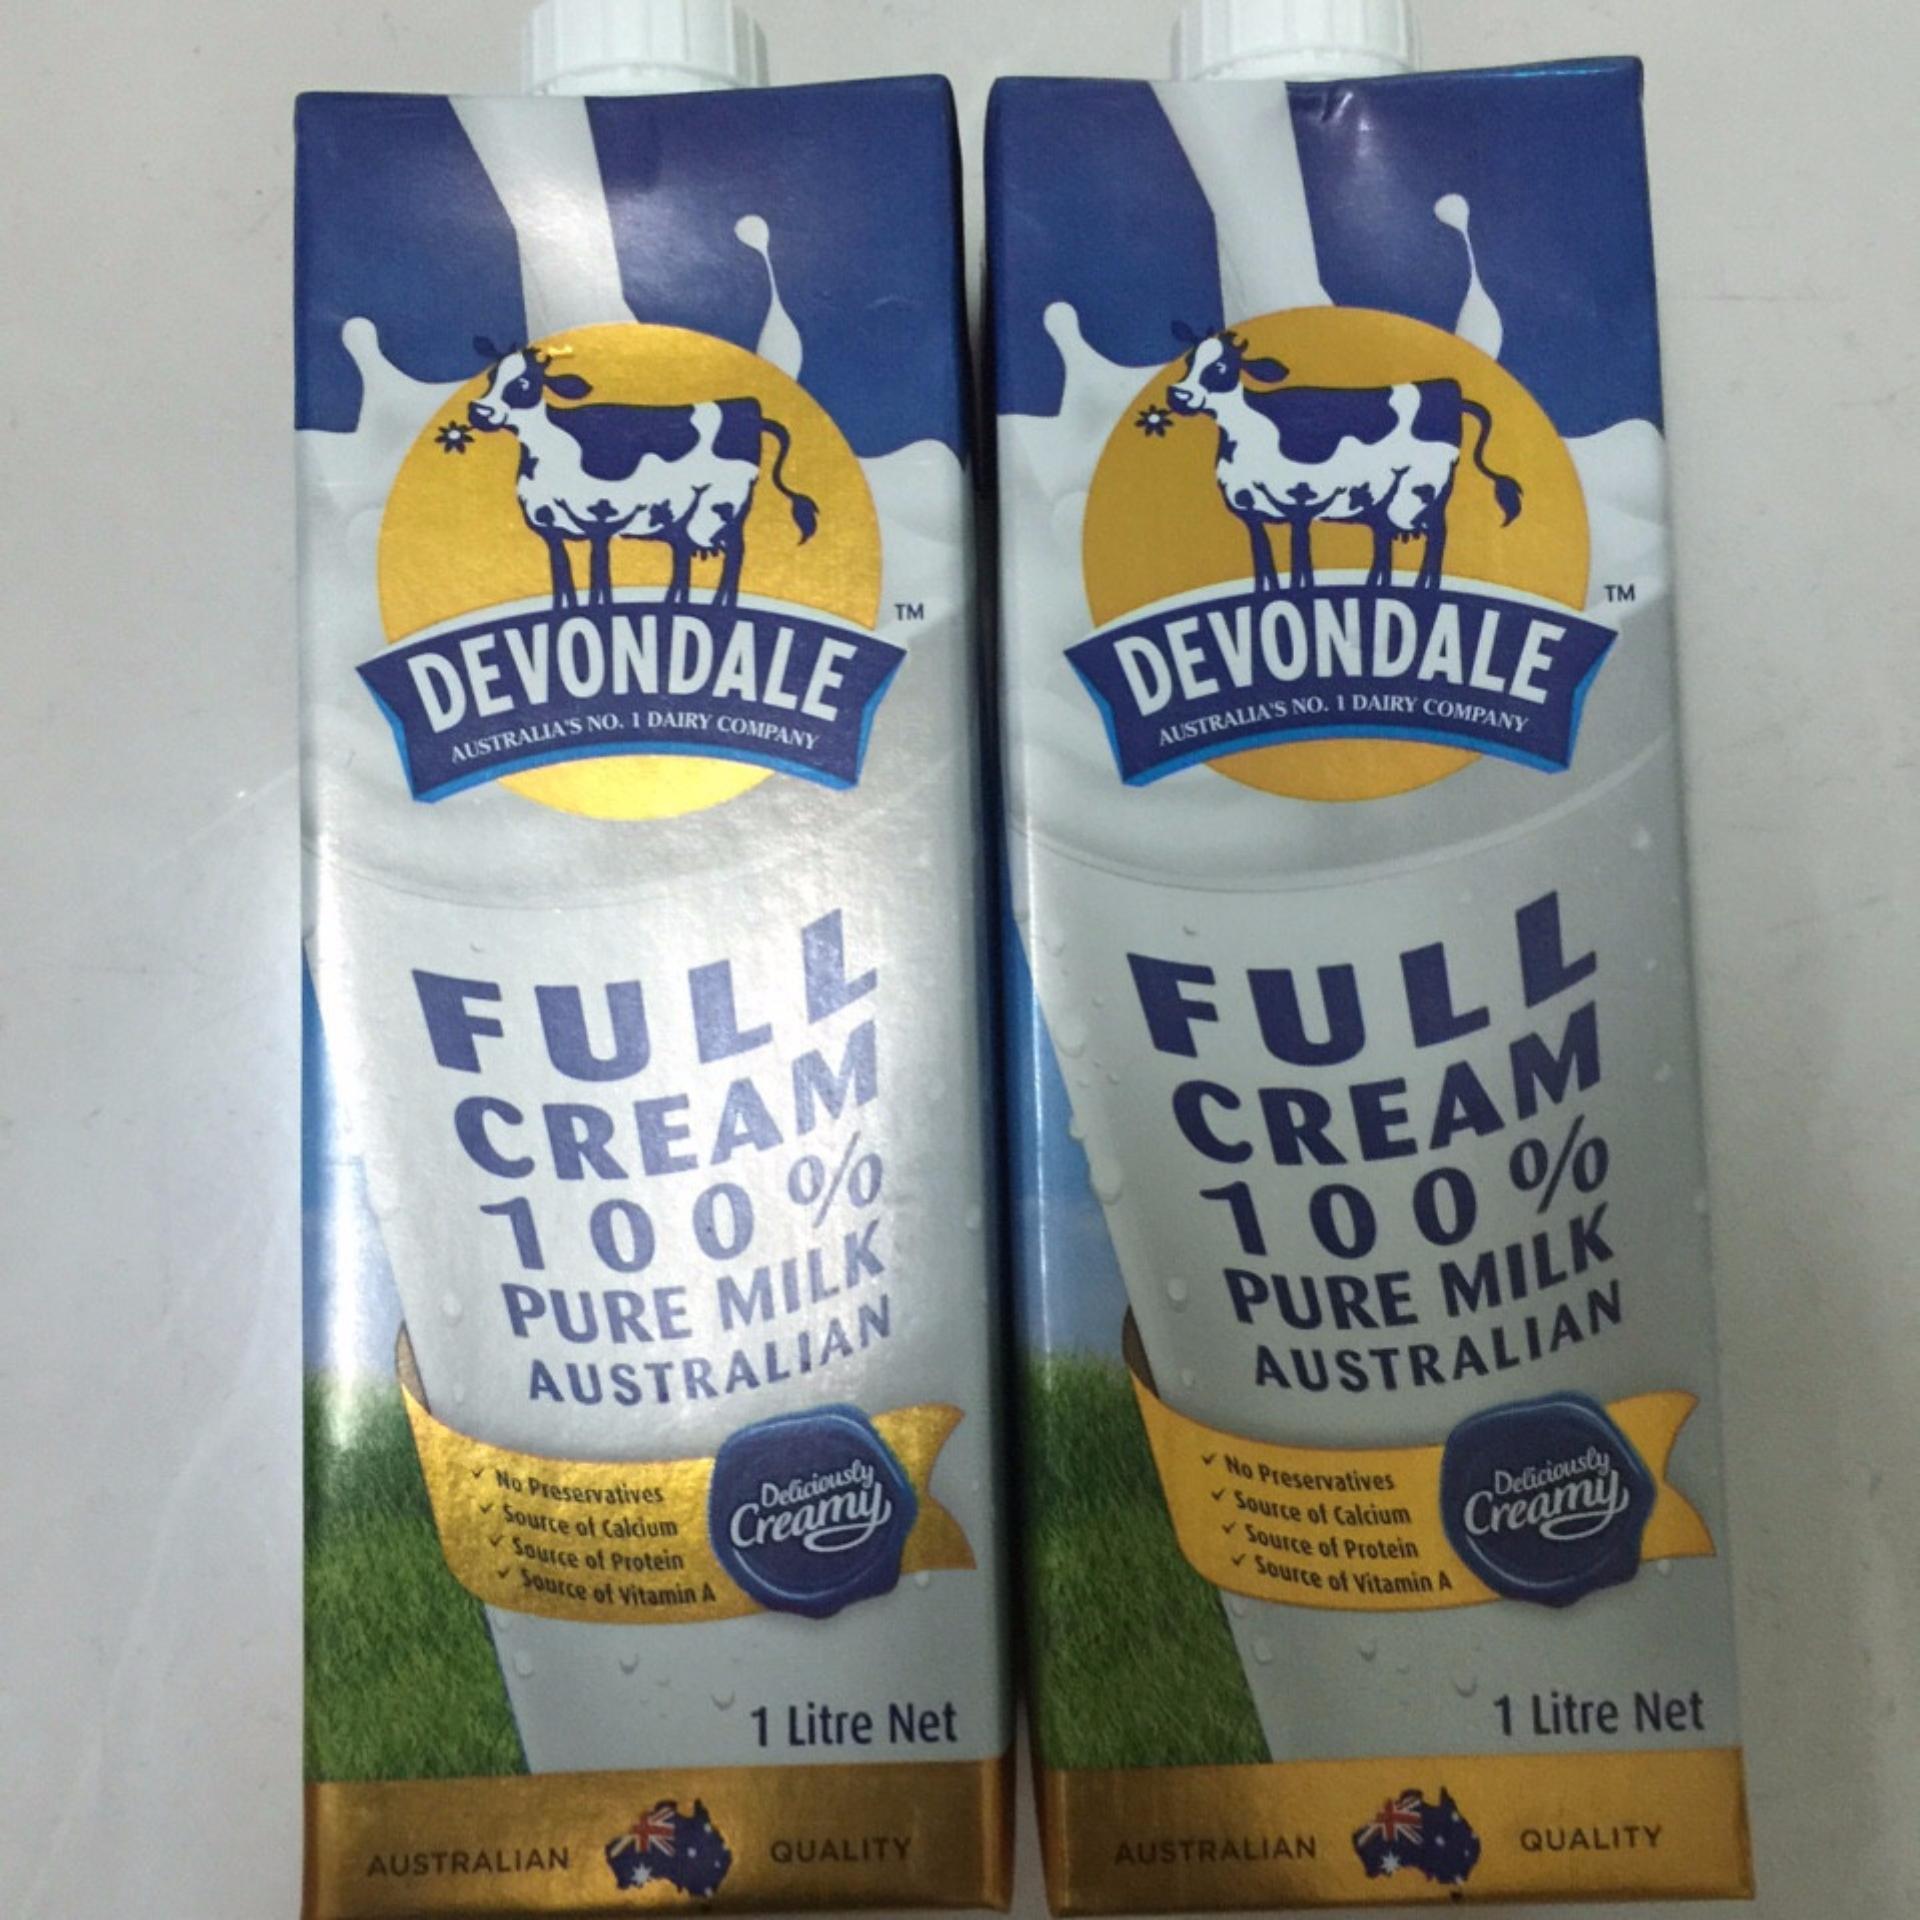 Bộ 02 Hộp Sữa Fullcream Devondale 1lit